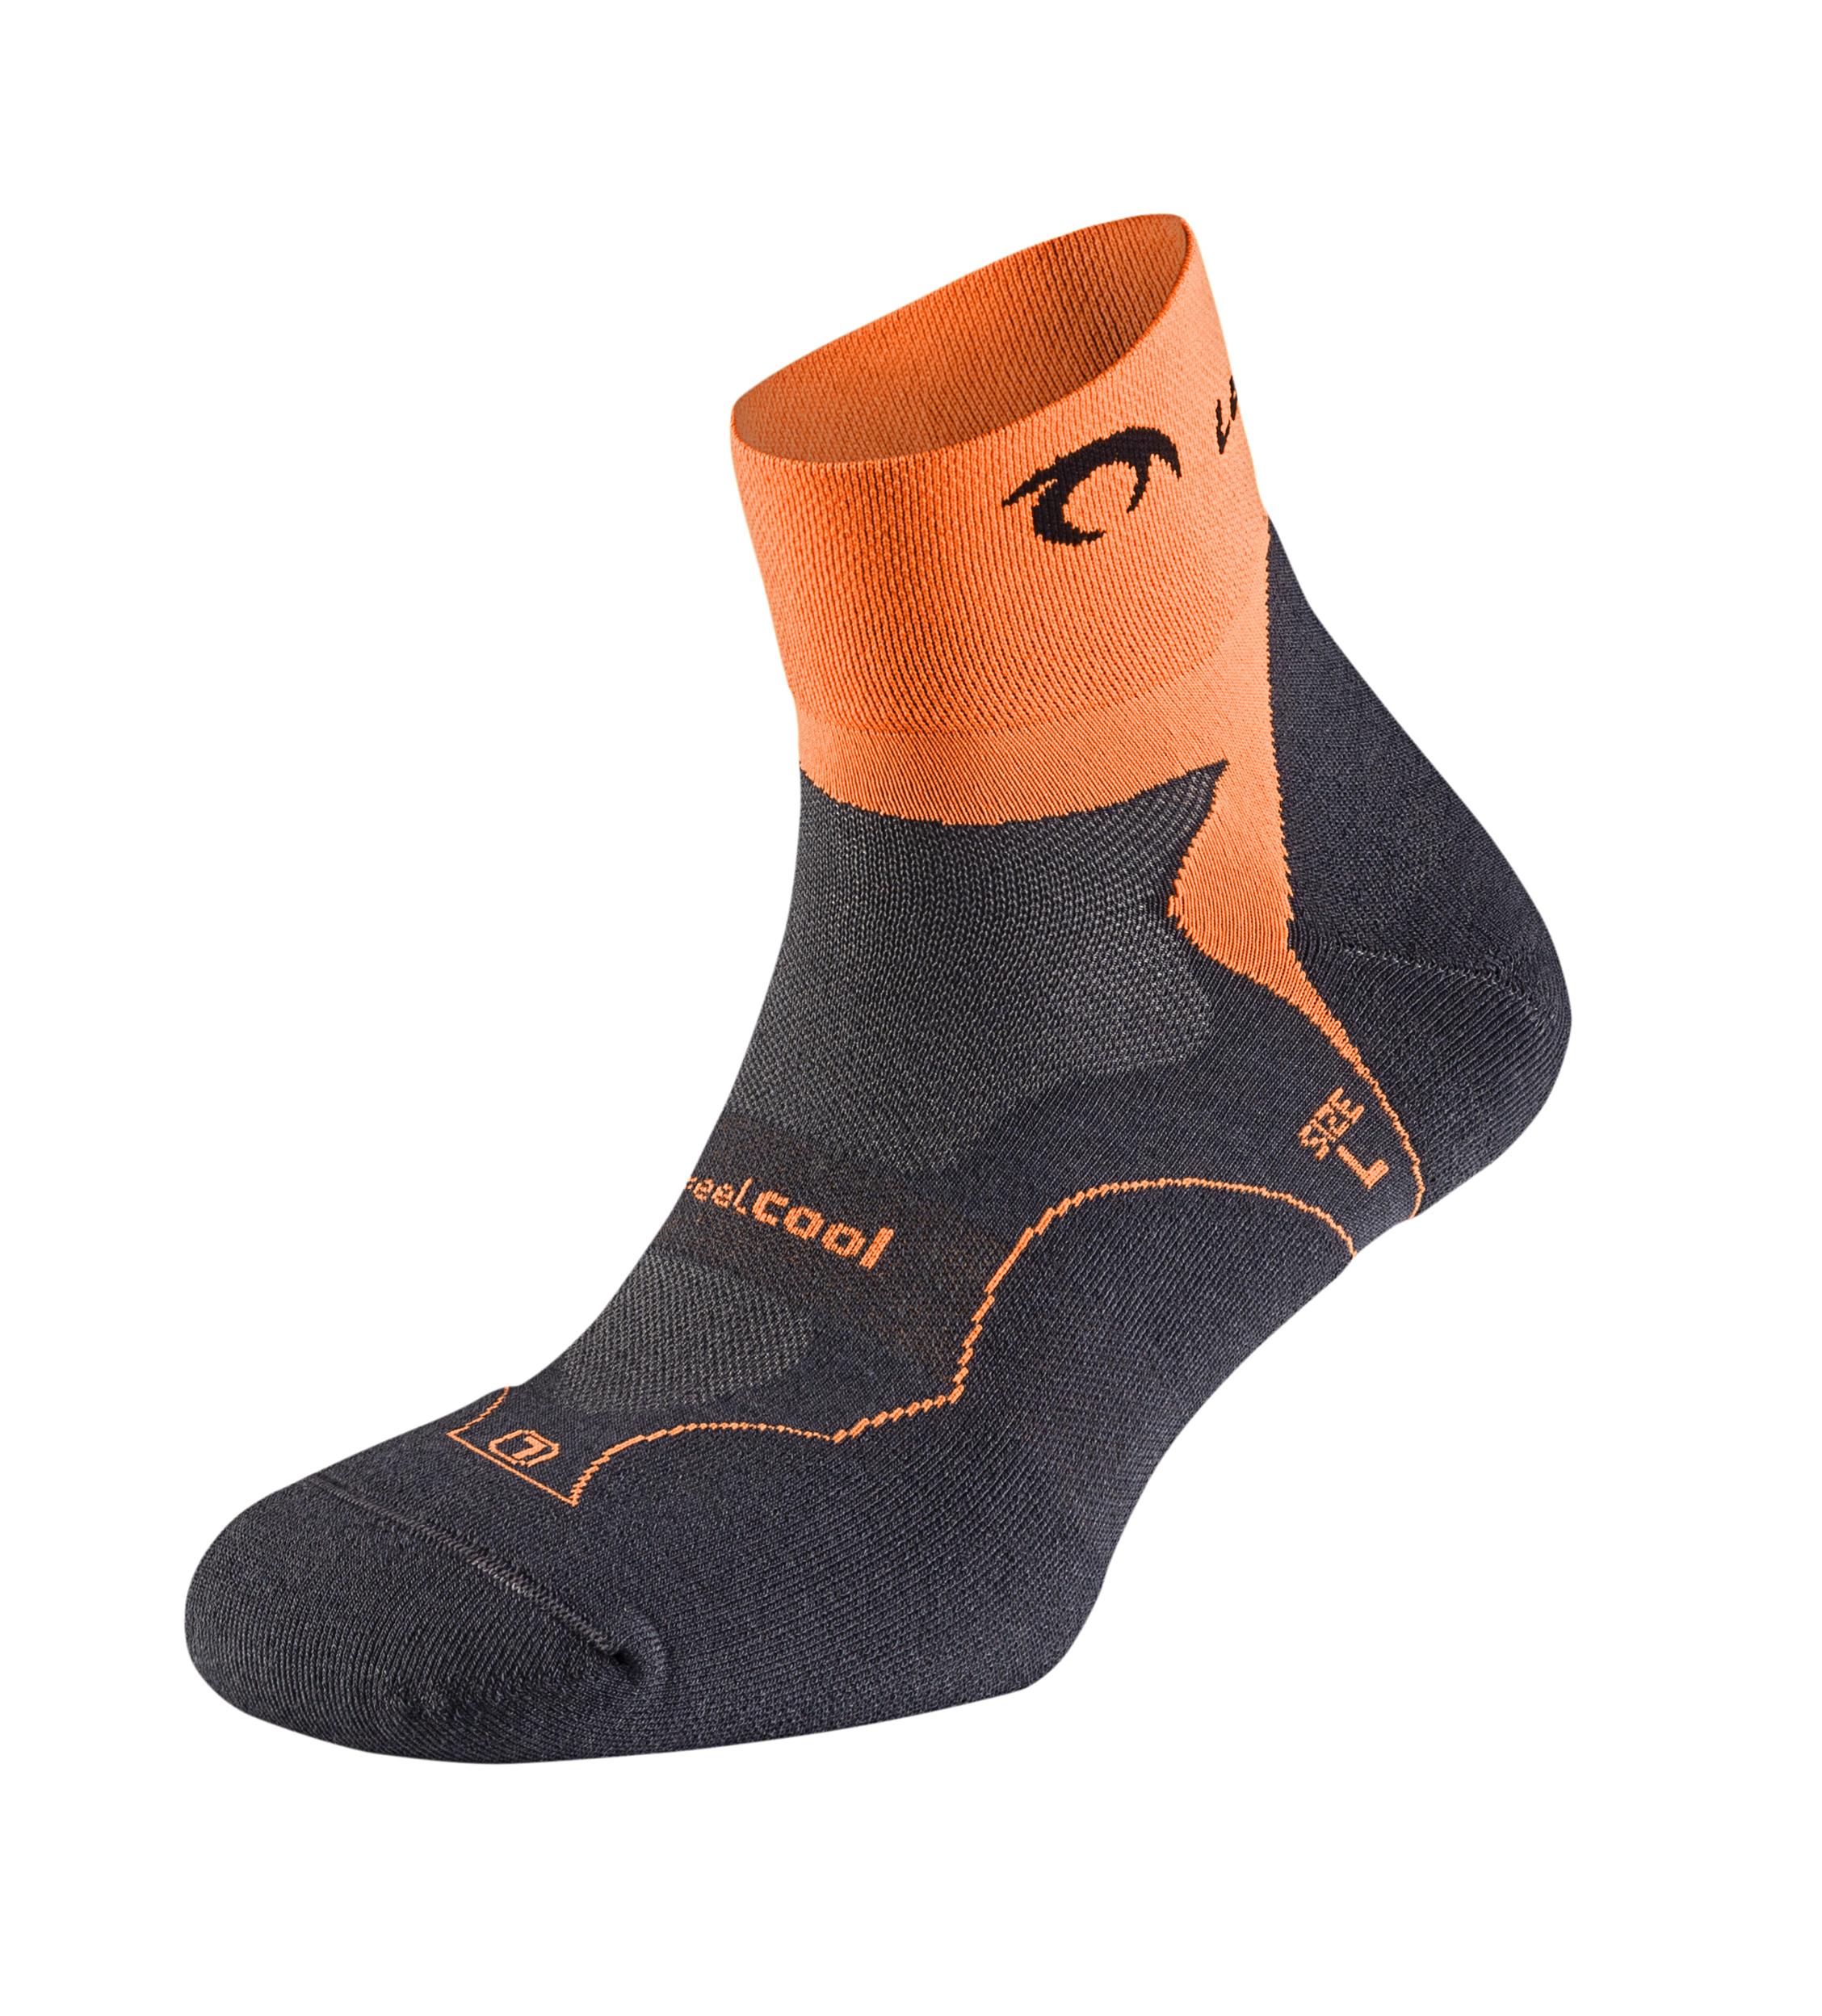 Calcetines para trail running Lurbel Desafío